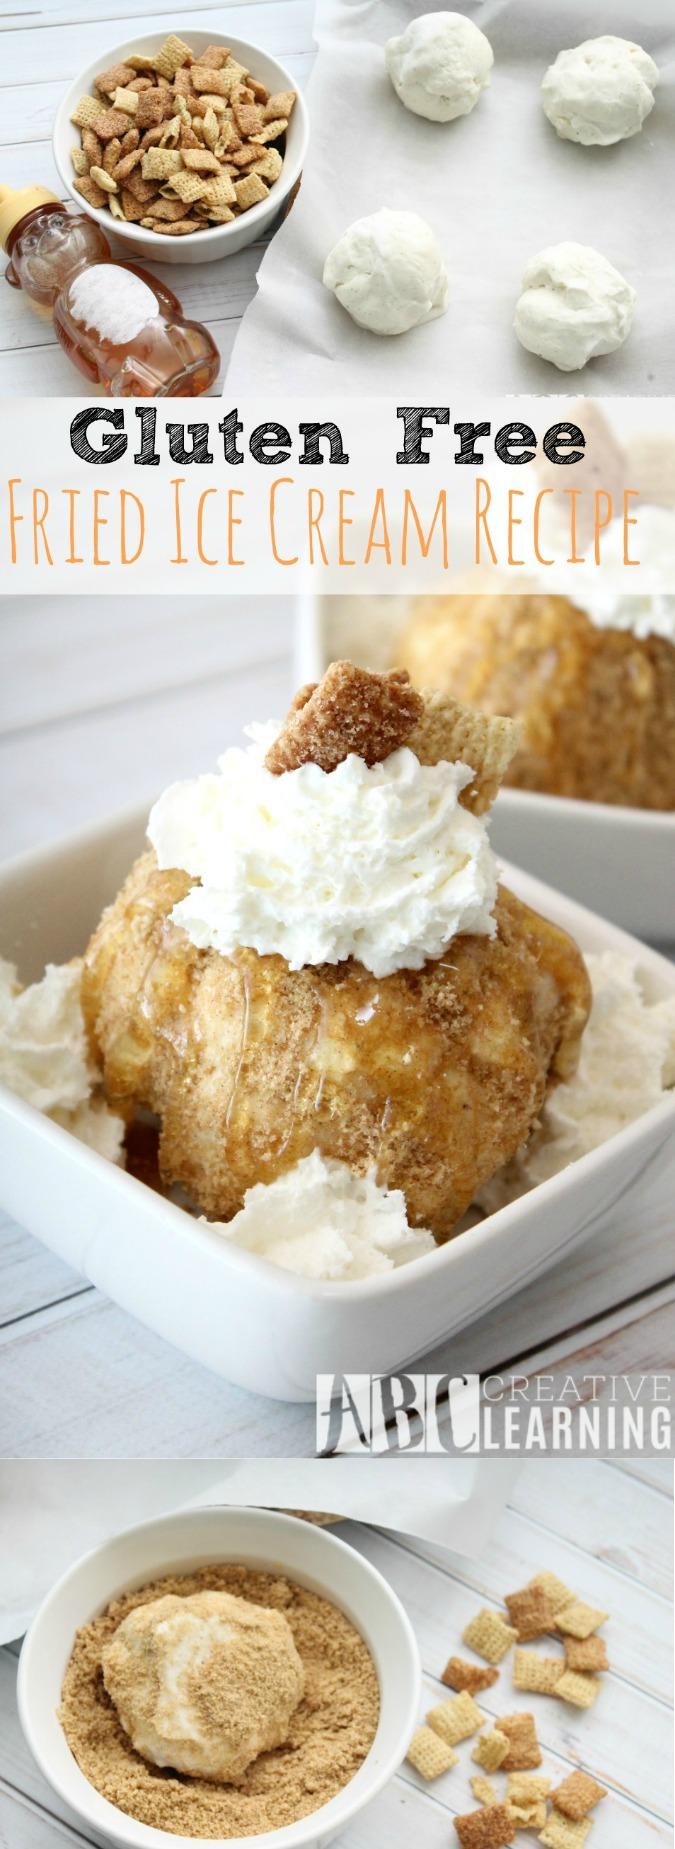 Gluten Free Fried Ice Cream Recipe - abccreativelearning.com